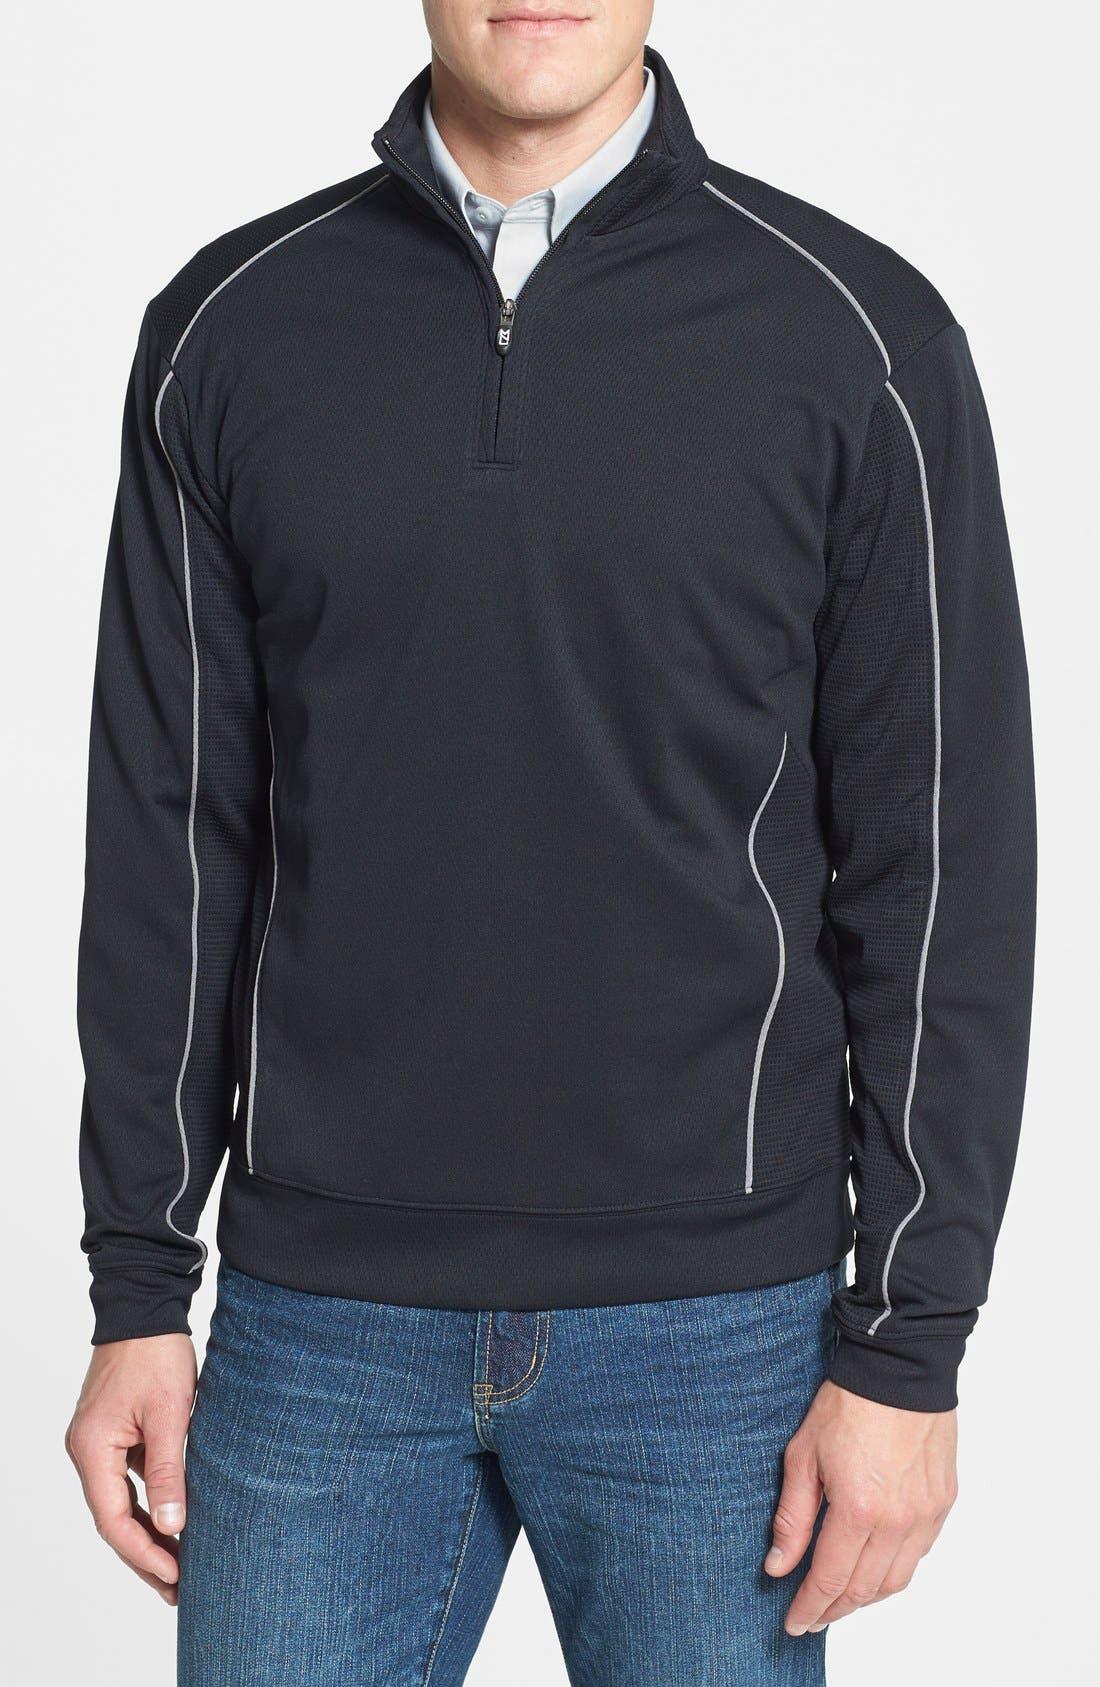 Cutter & Buck 'DryTec® Edge' Half Zip Mesh Pullover